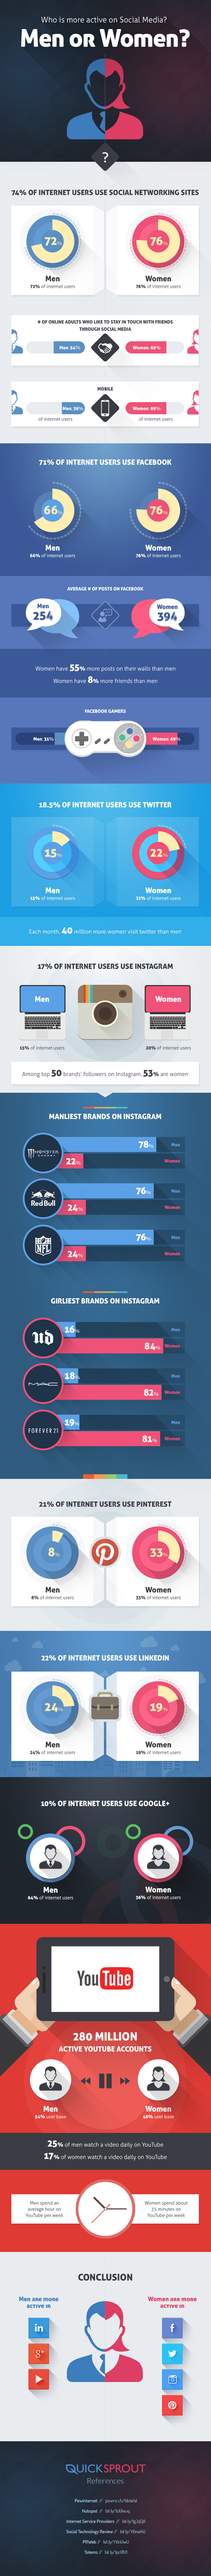 Social-Media-Usage-by-Gender